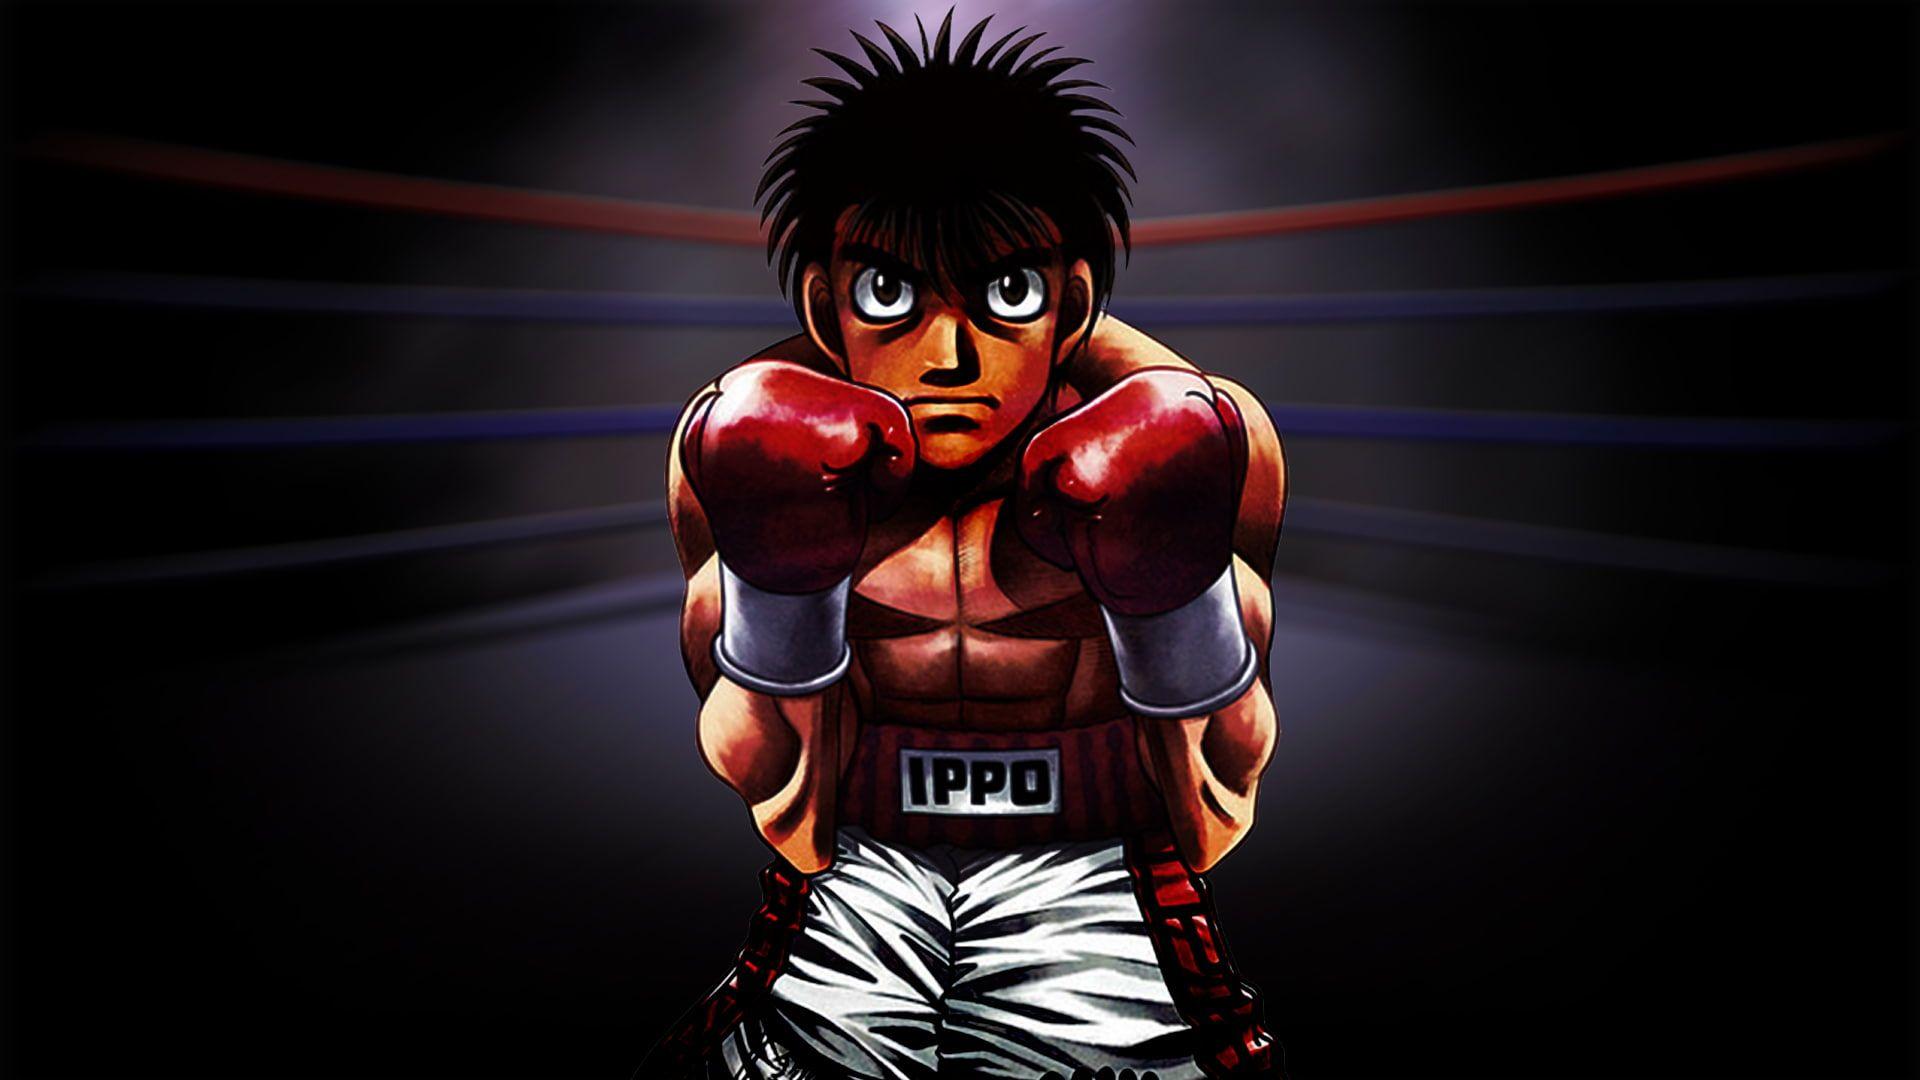 Anime Manga Hajime No Ippo Ippo Boxing Anime Boys 1080p Wallpaper Hdwallpaper Desktop Anime Boy Anime Manga